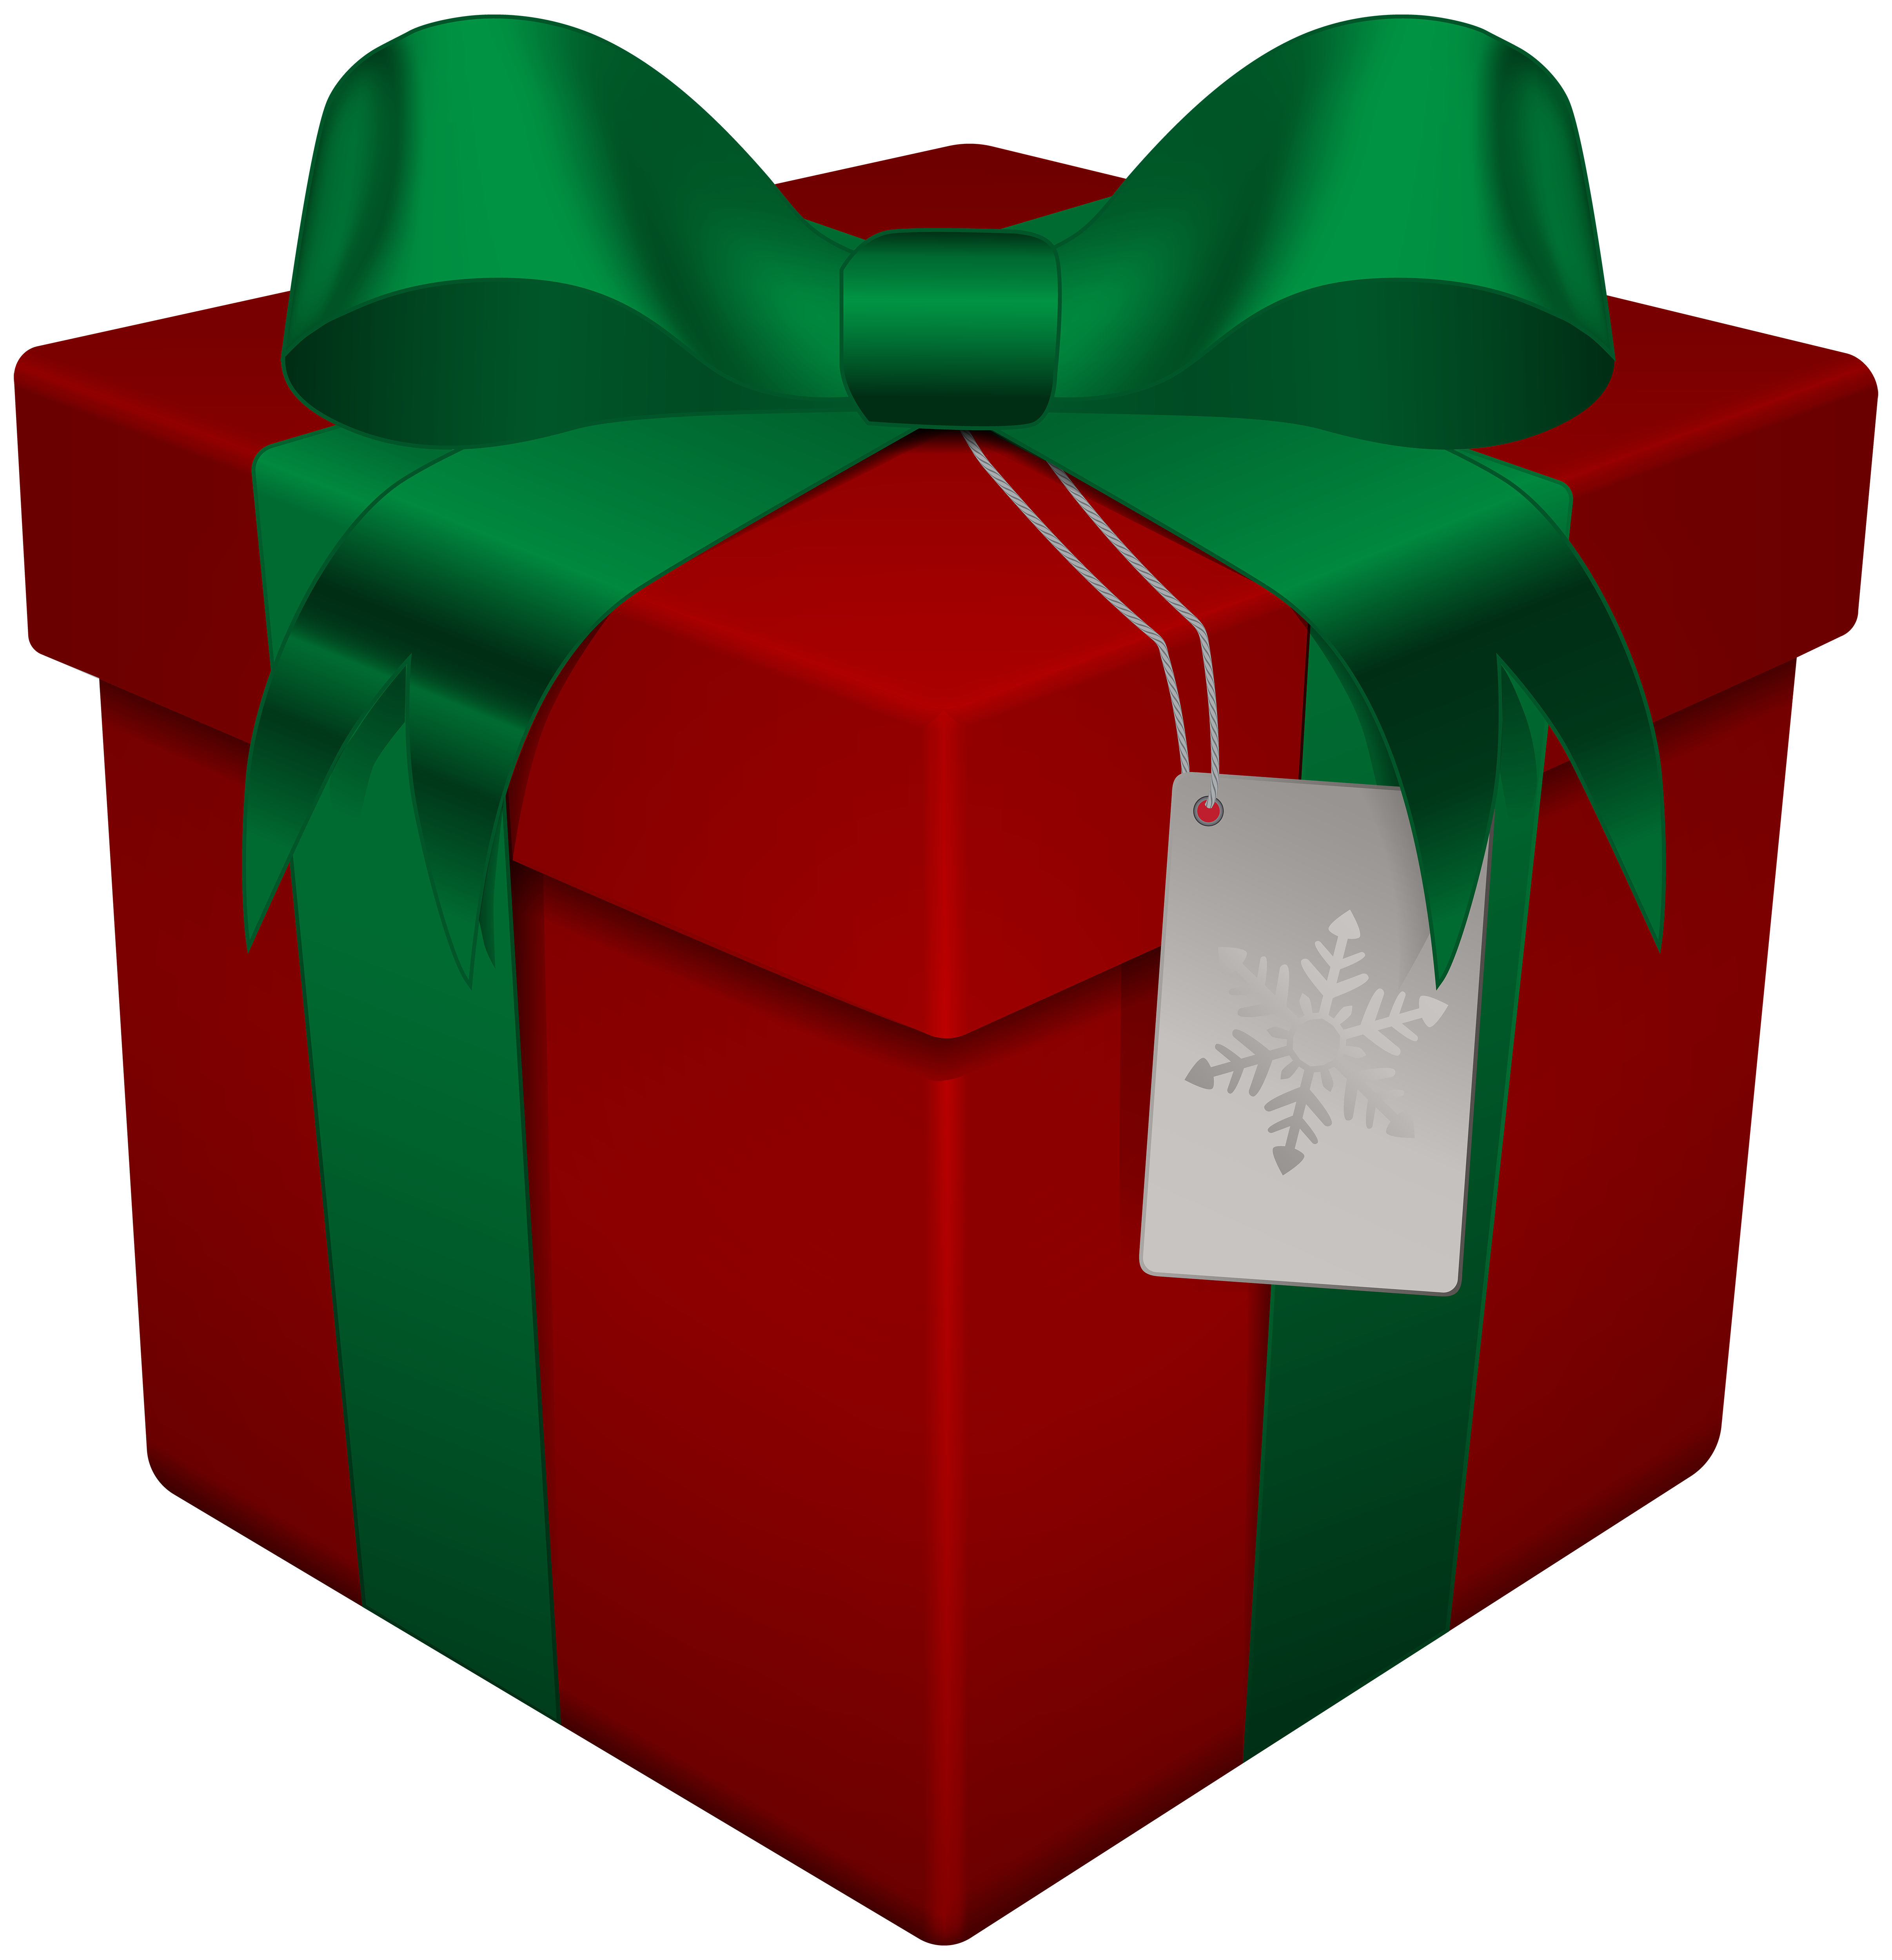 Christmas gift Santa Claus Clip art.